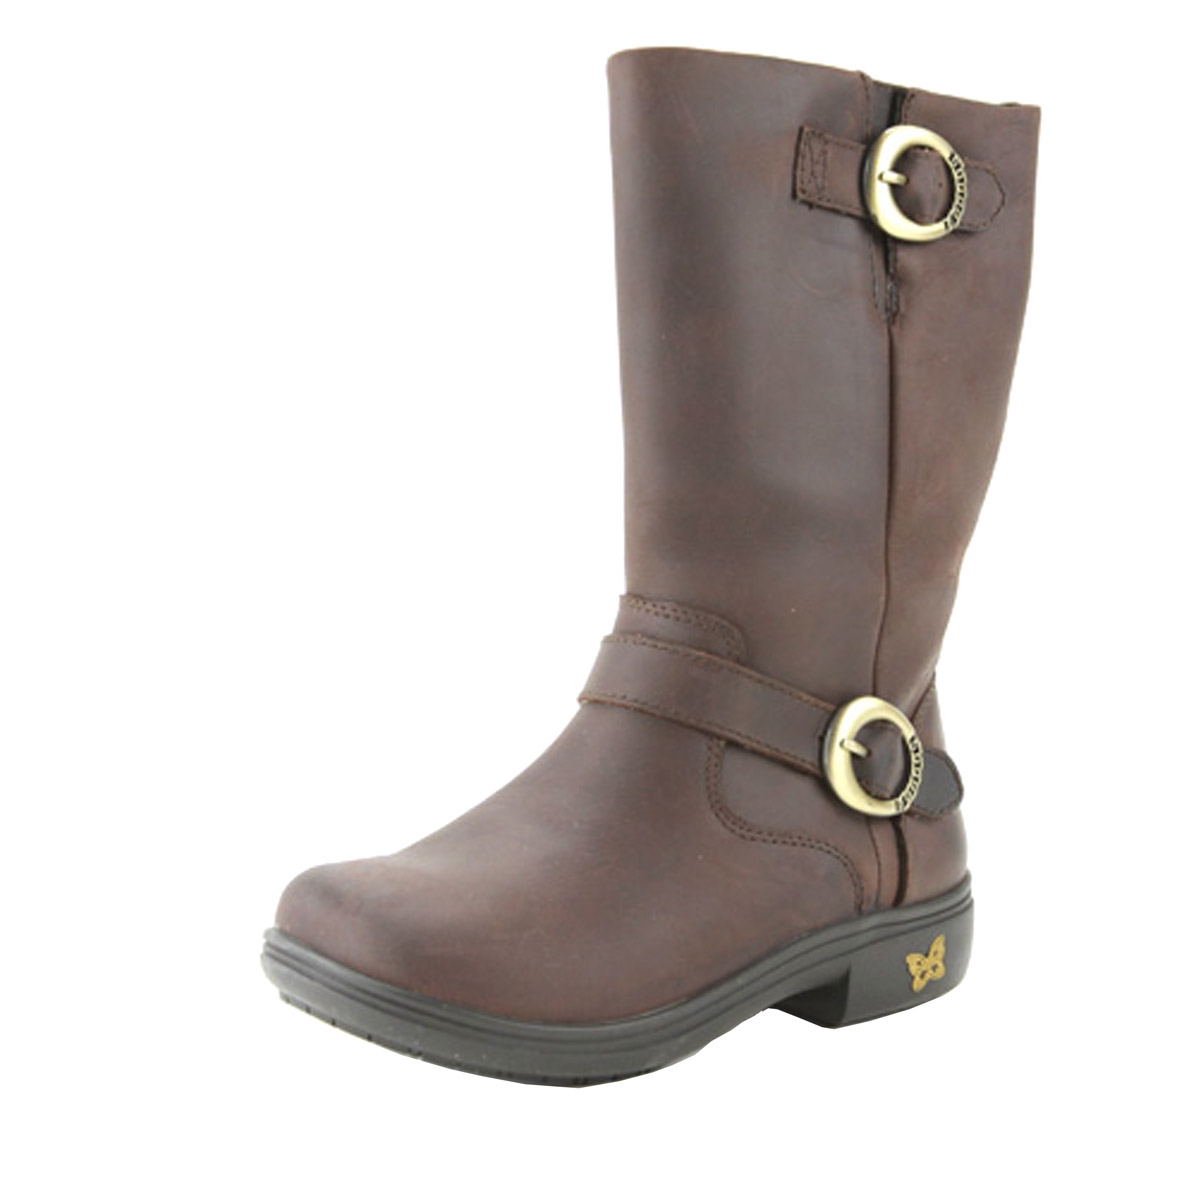 Women's Mid Calf Boots For Sale Alegria Cami Gravy Pull Women Up CAM 602 Cheap Sale